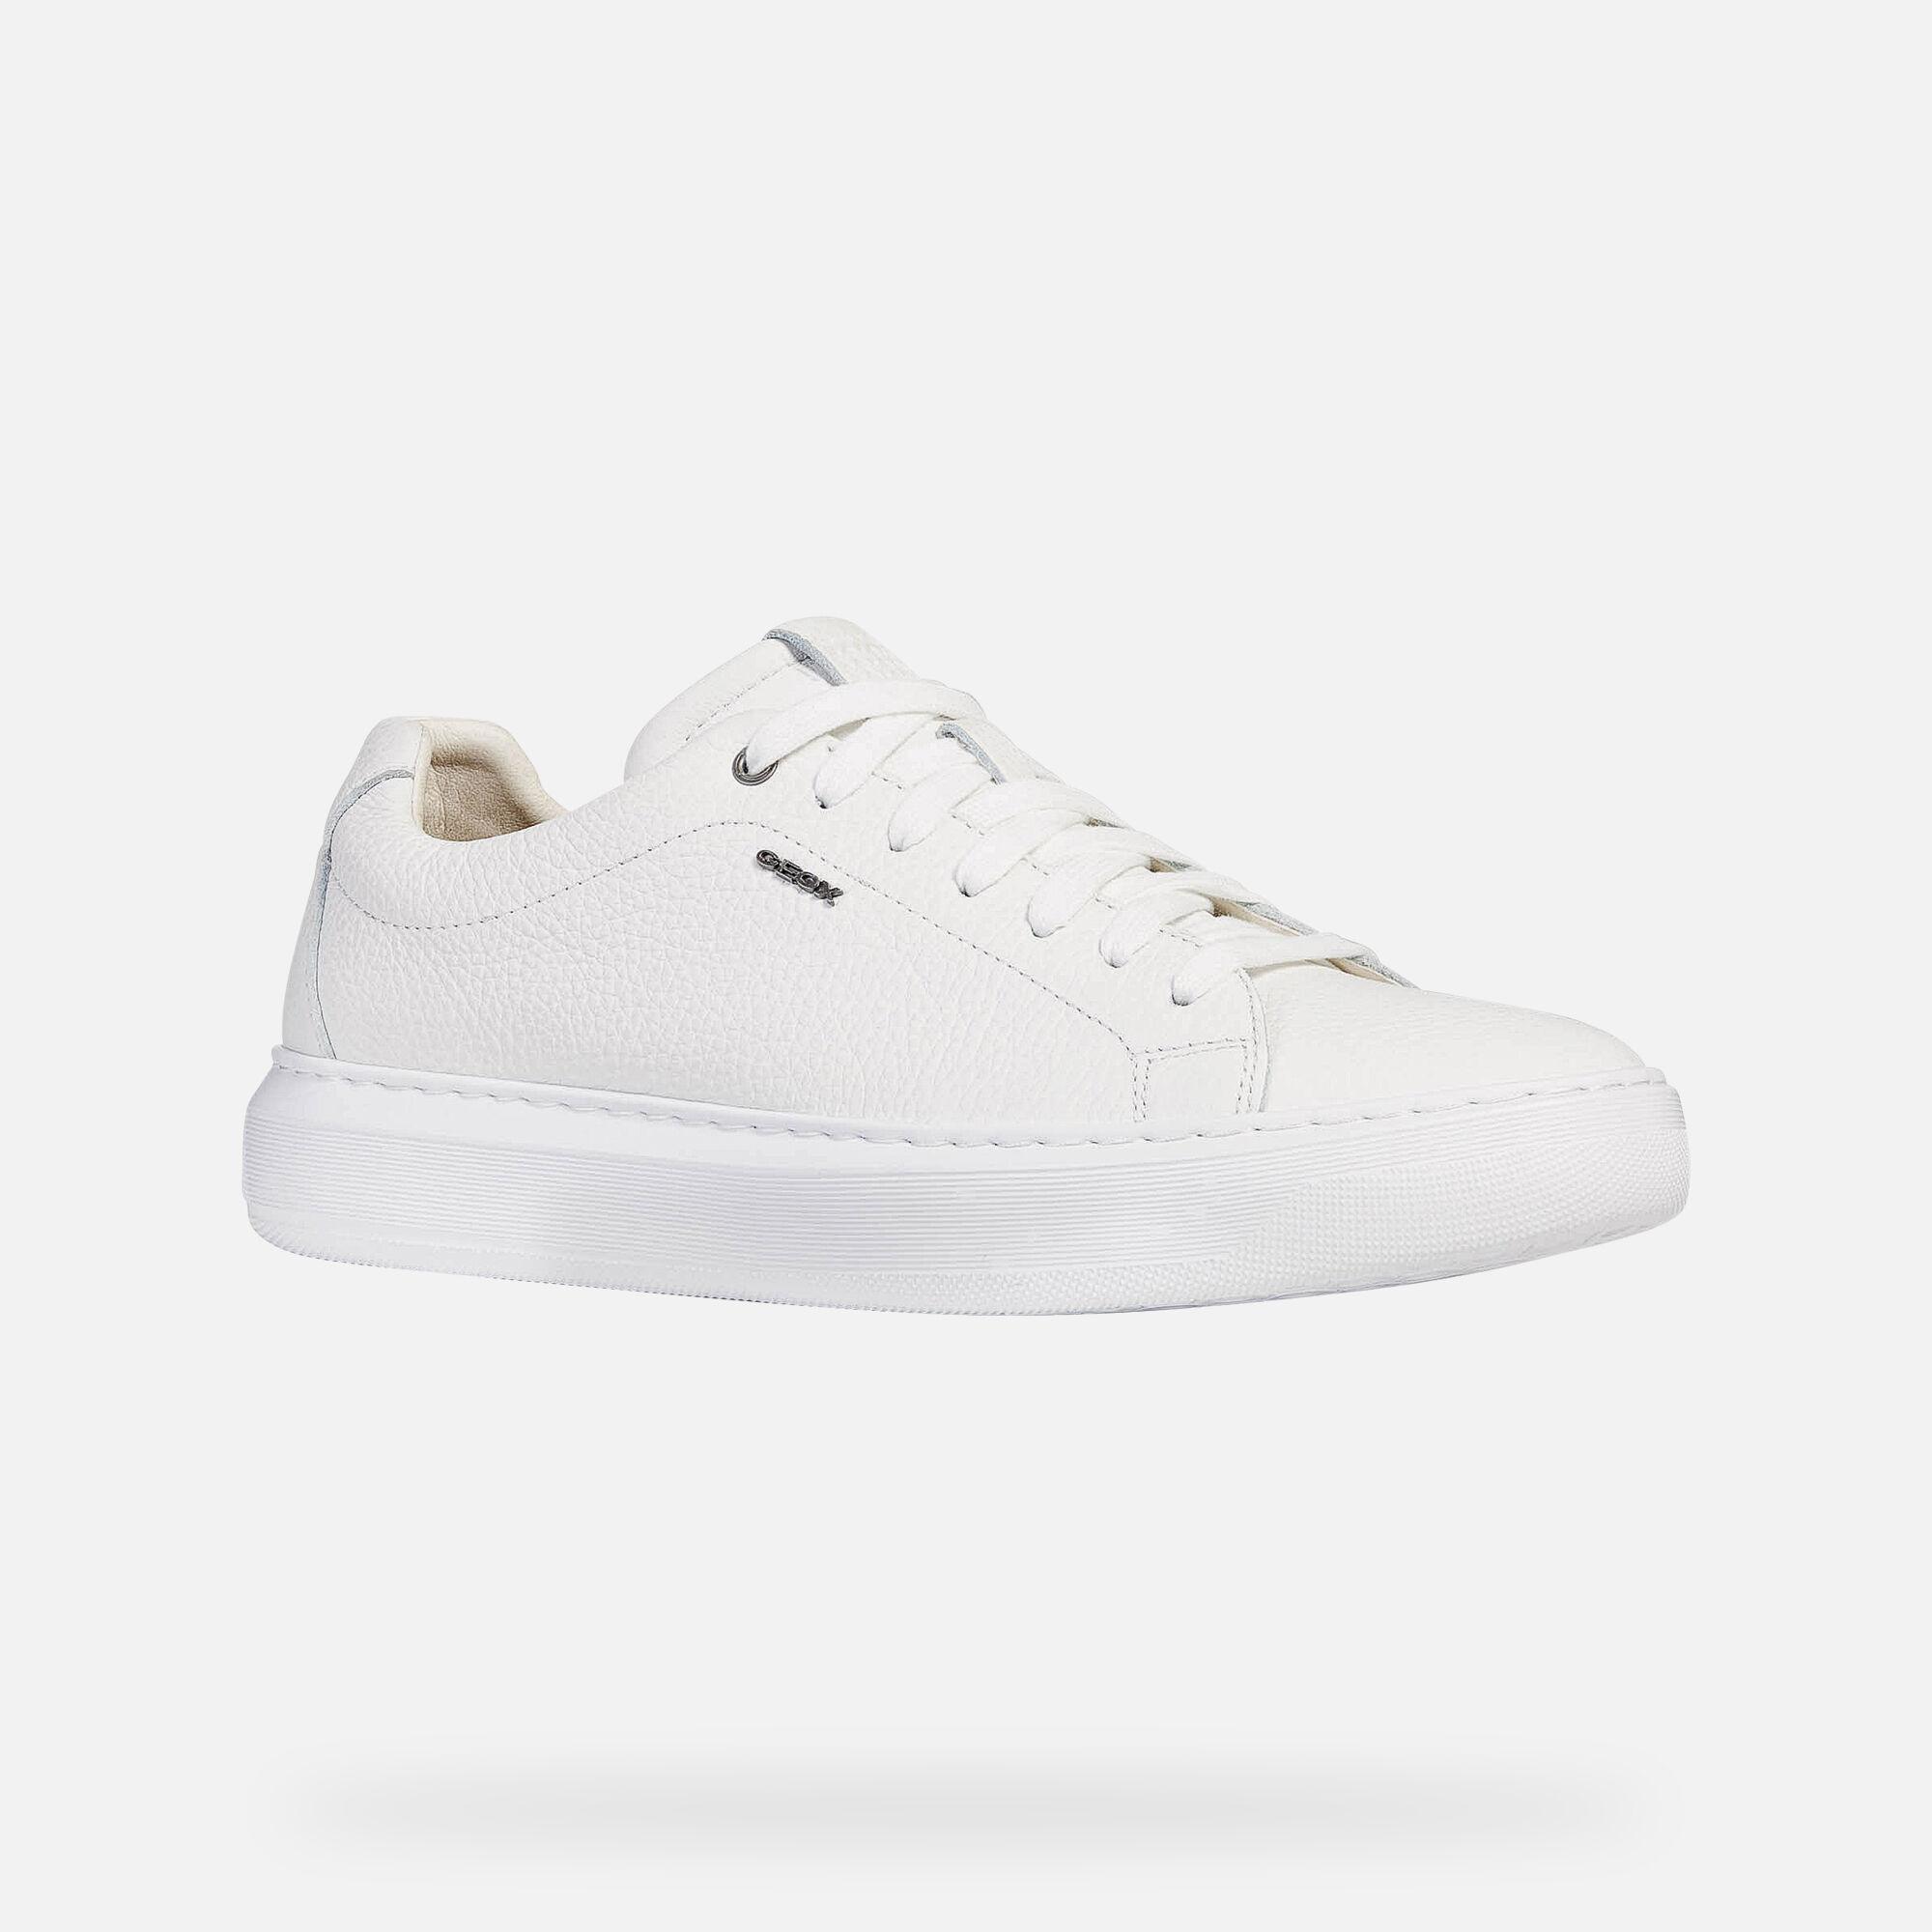 DEIVEN UOMO Jeans | Sneakers Geox Uomo